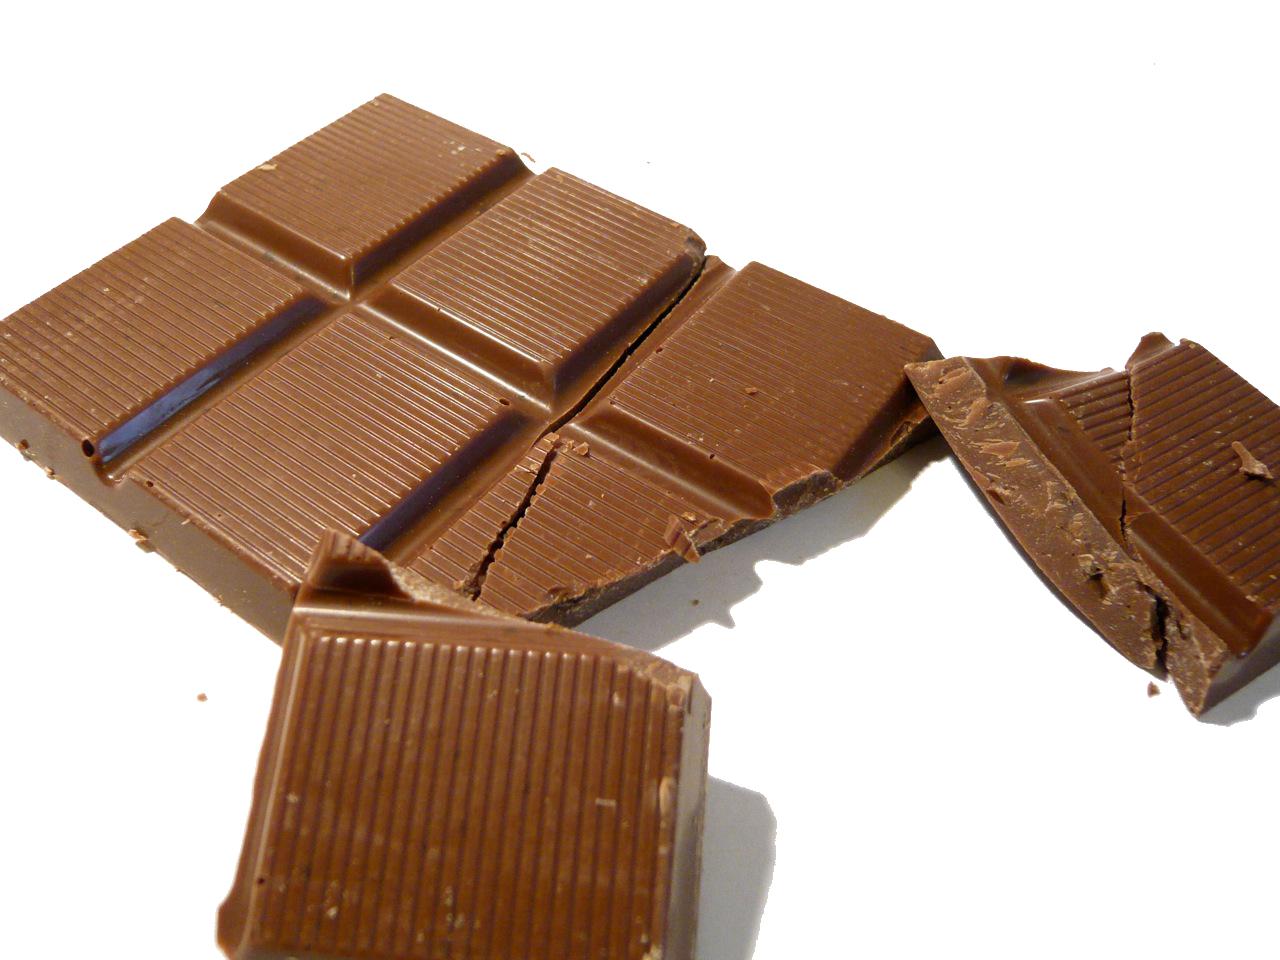 Chocolate bar PNG image